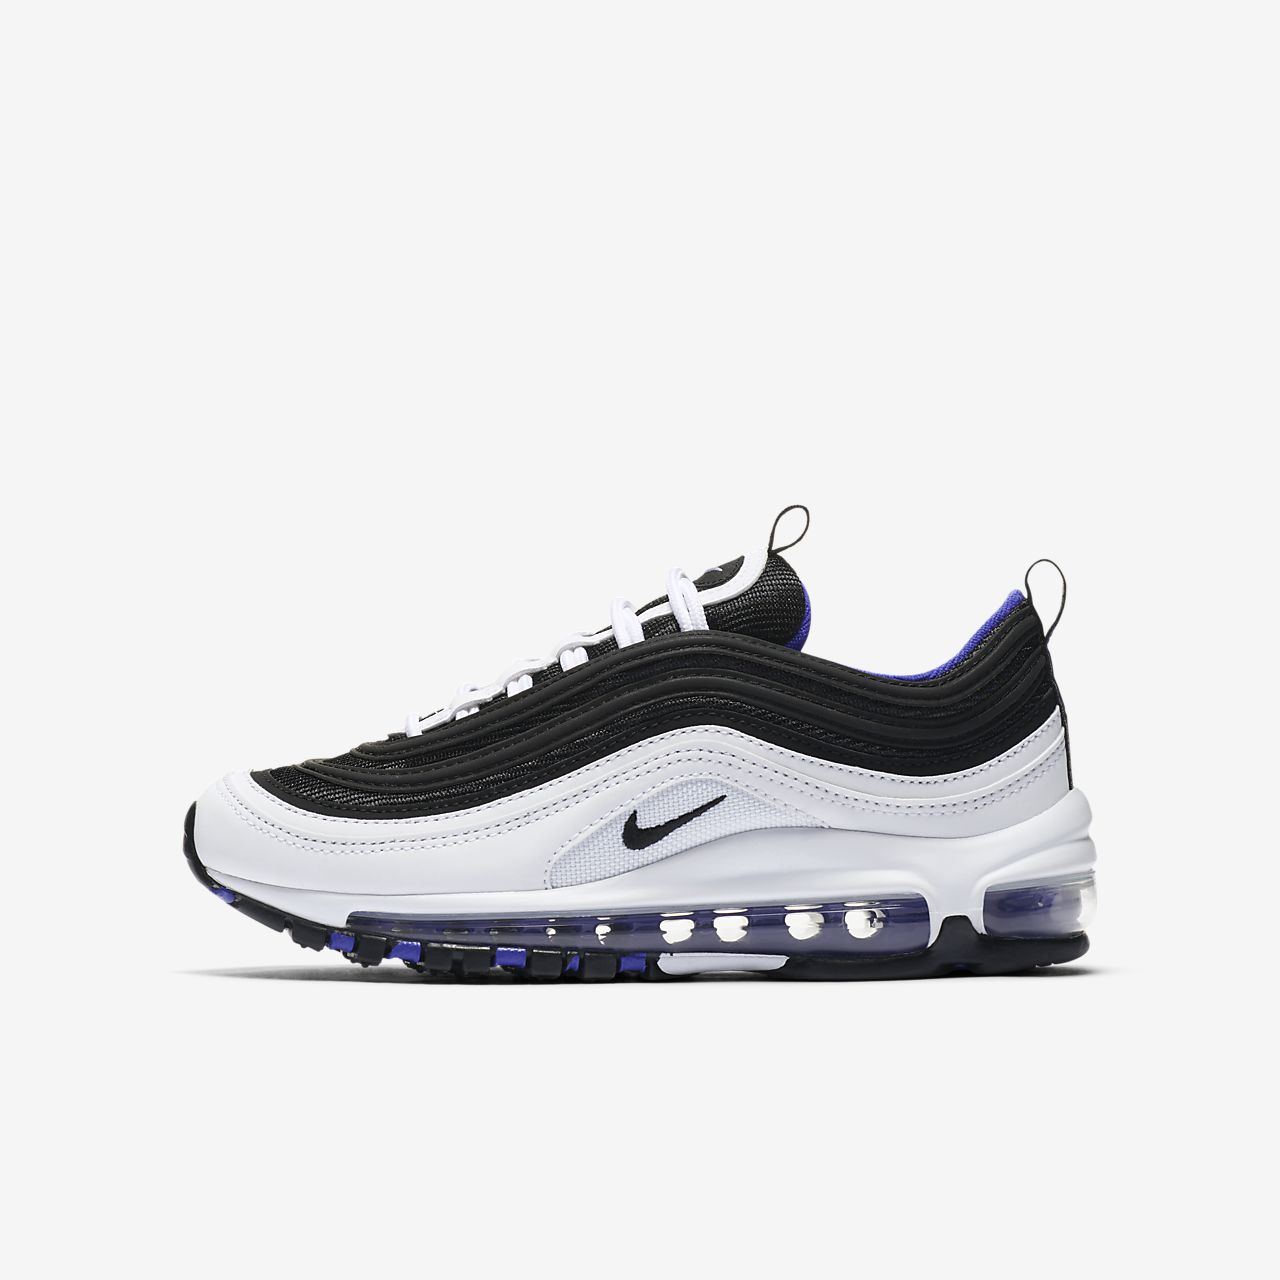 16ac787099f ... low cost nike air max 97 big kids shoe fe50c bd816